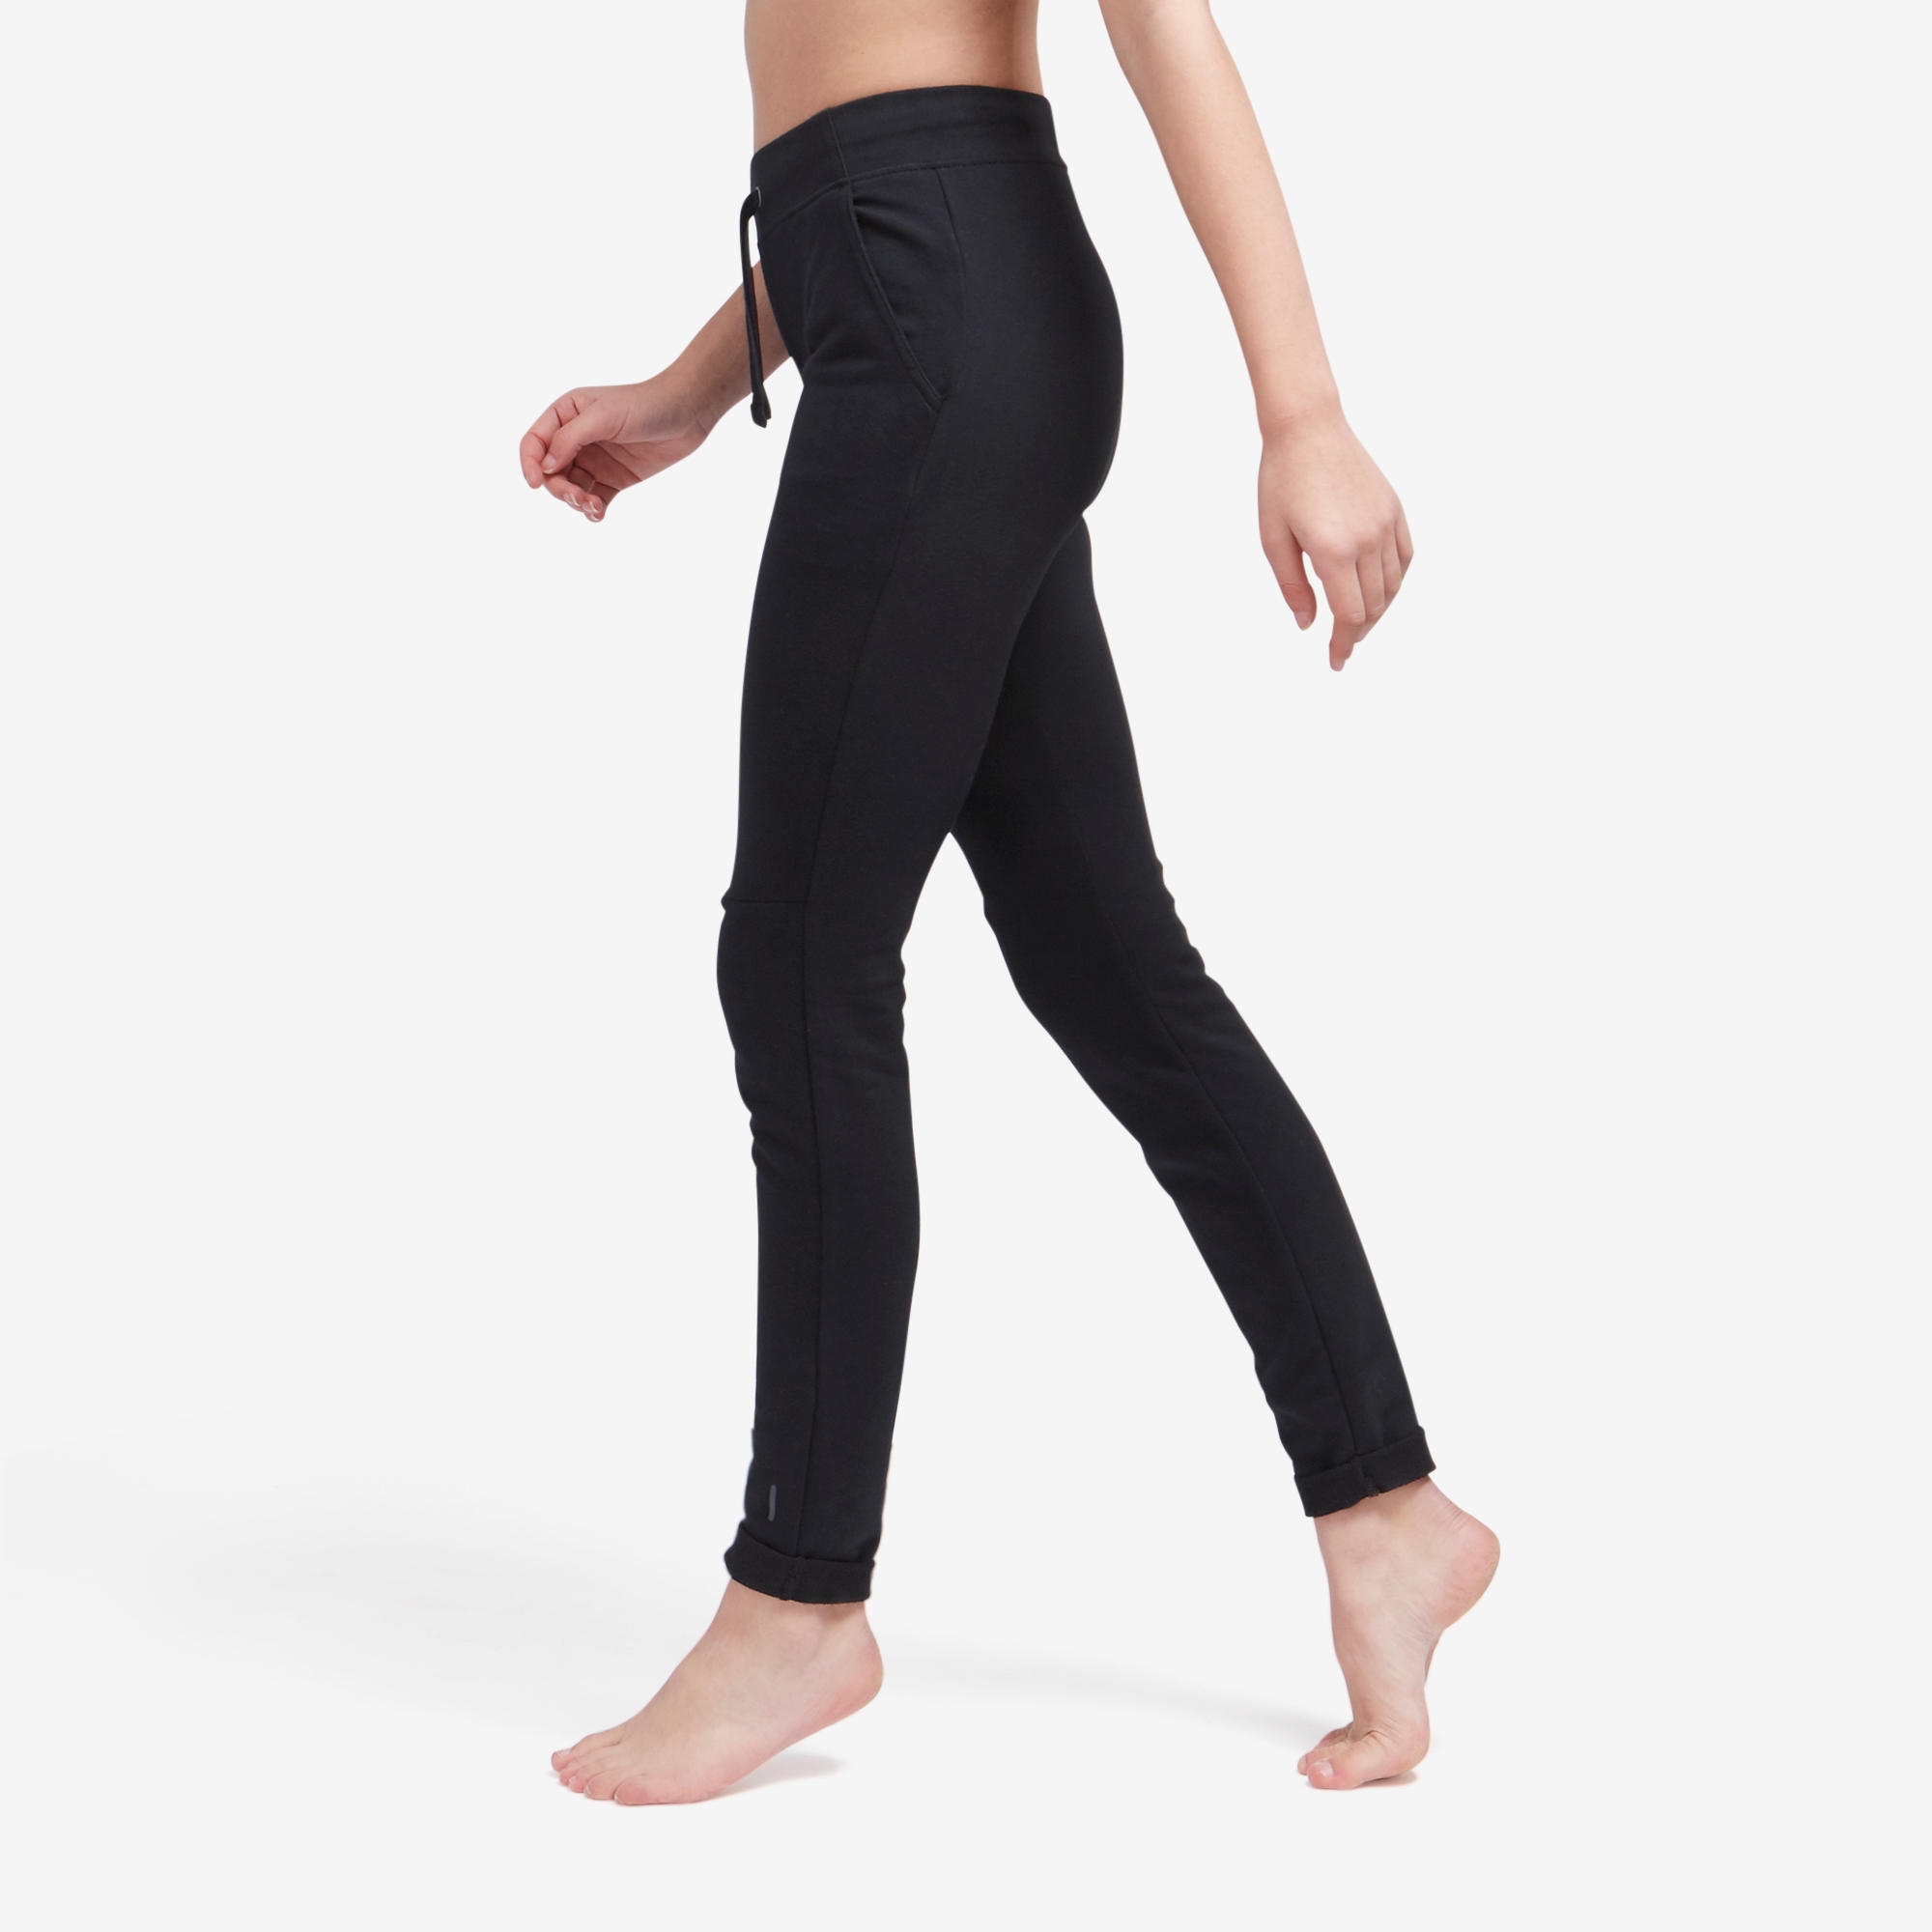 Pantalon Slim 500 negru damă imagine